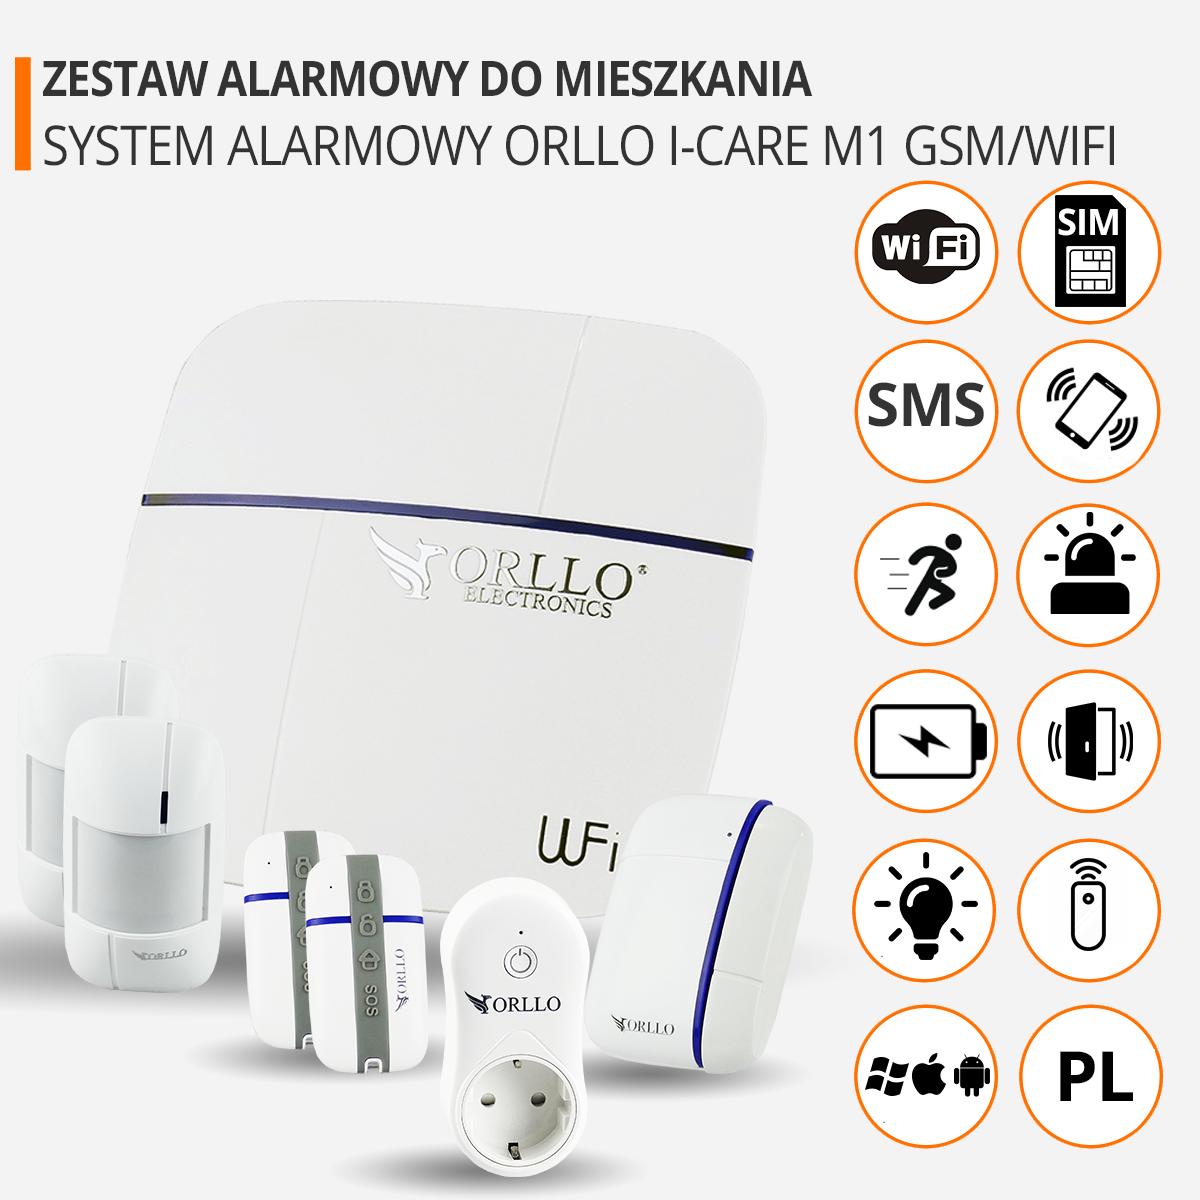 zestaw alarmowy do mieszkania funkcje orllo.pl